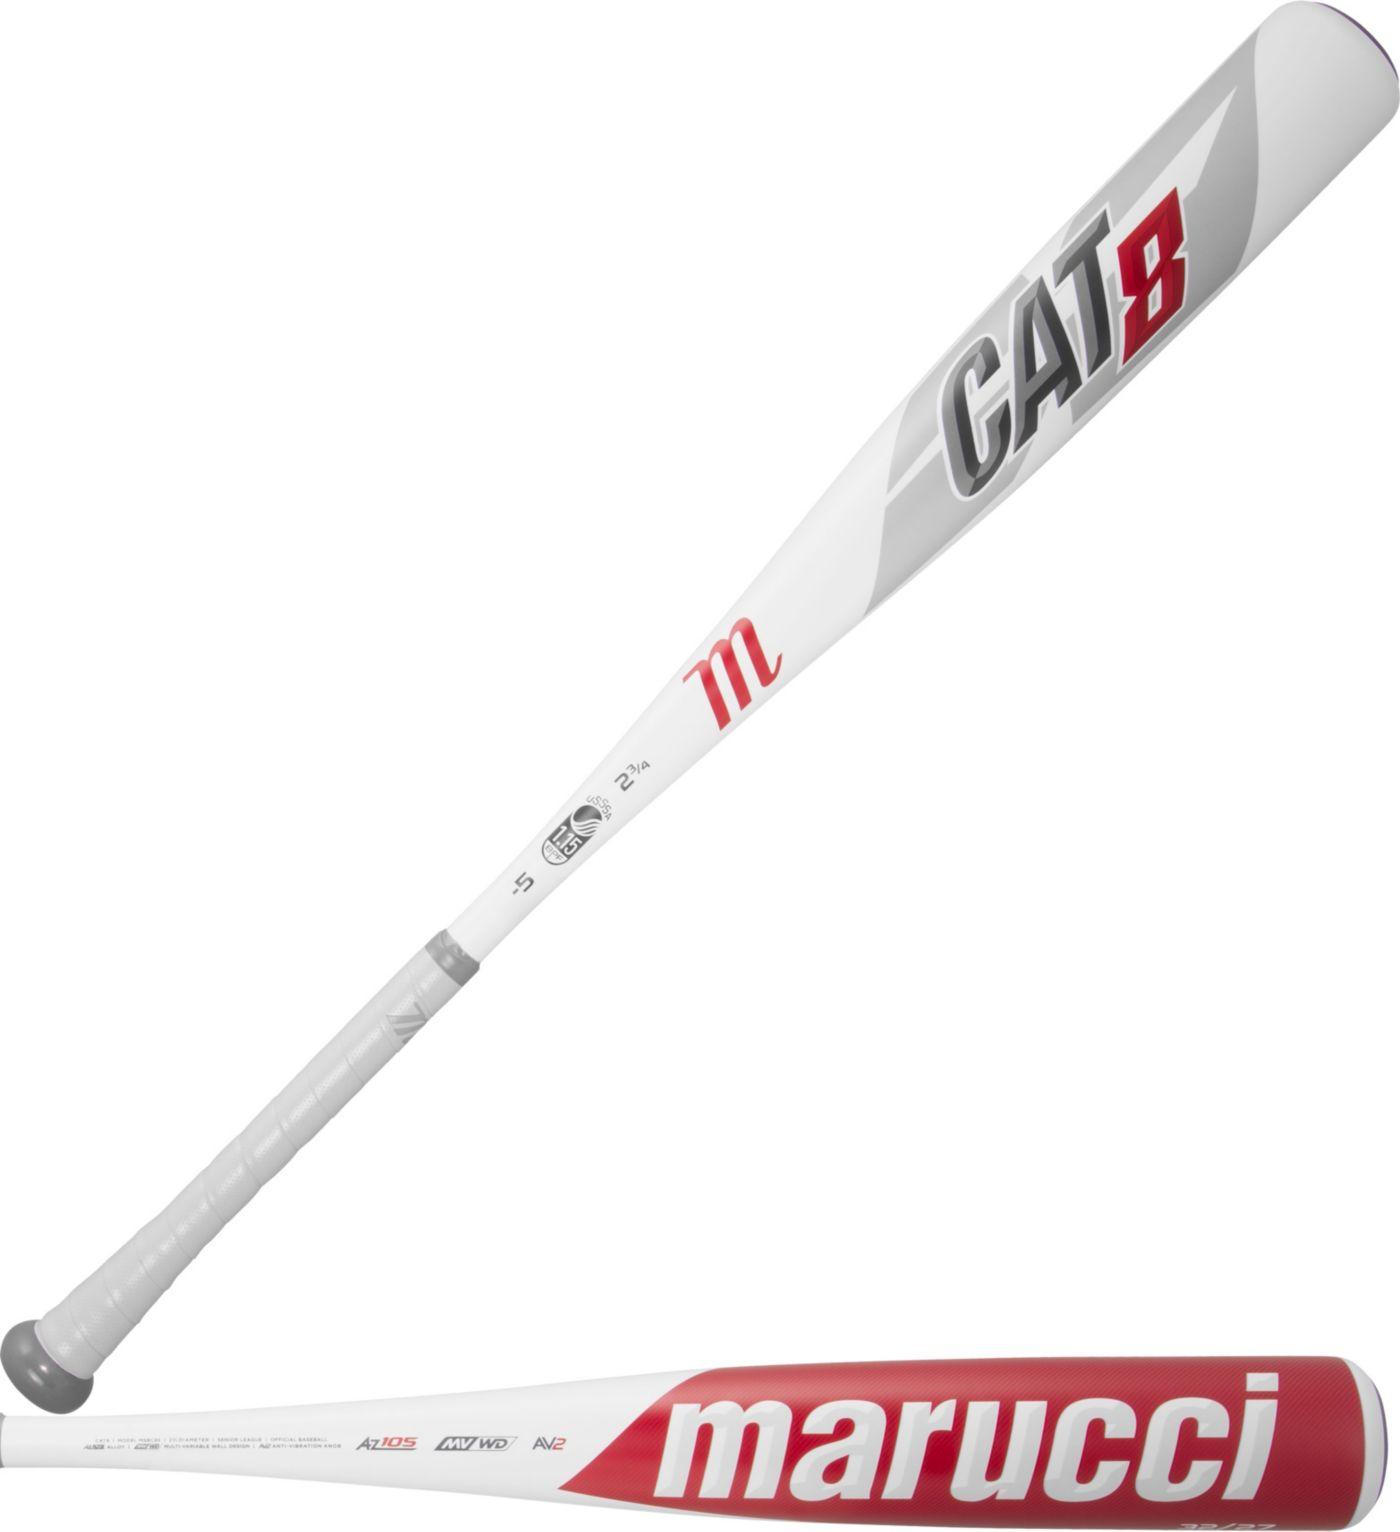 "Marucci CAT8 2¾"" USSSA Bat 2019 (-5)"